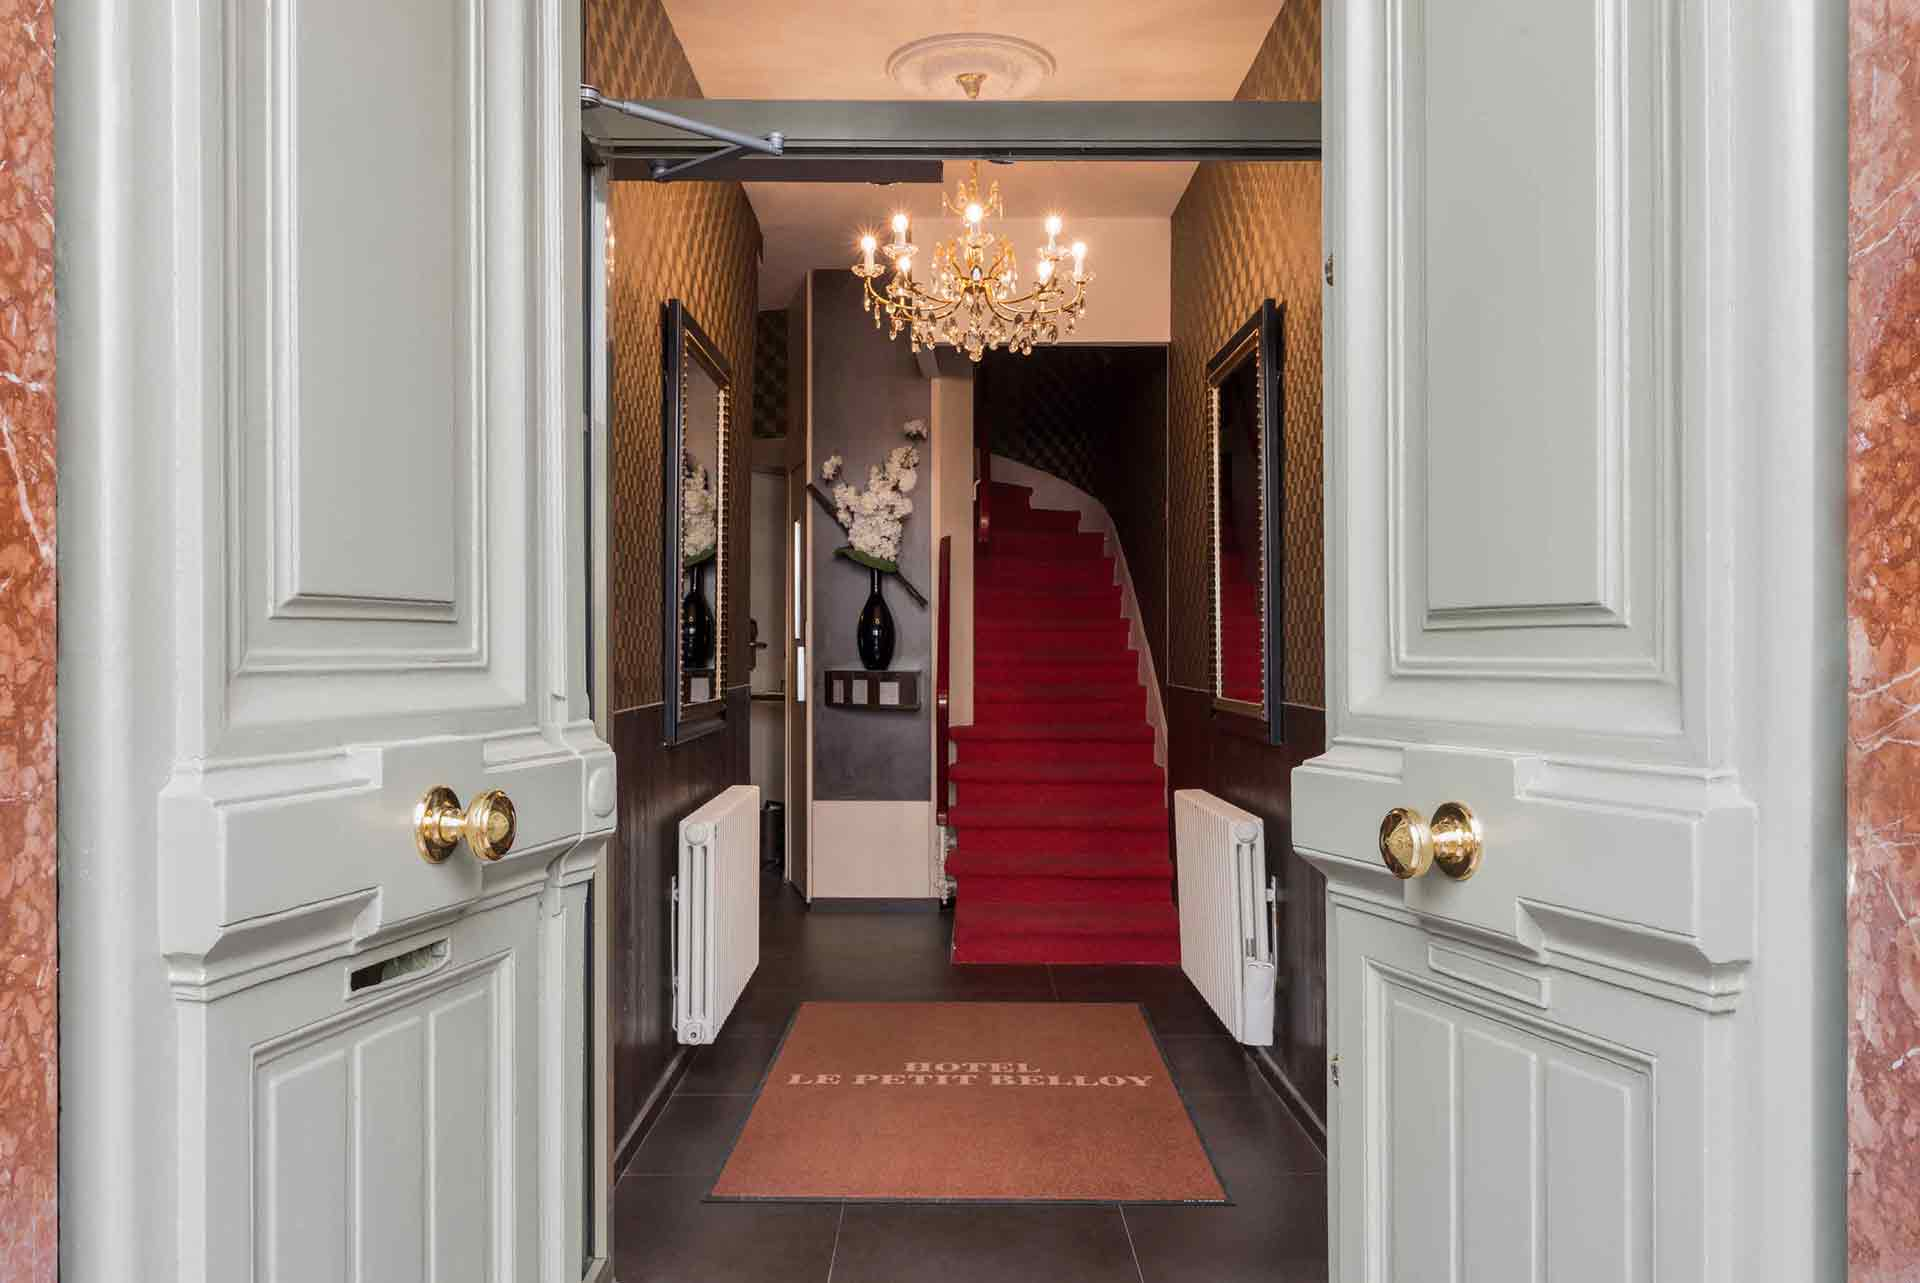 Galerie Photos - Hotel Notre-dame Paris